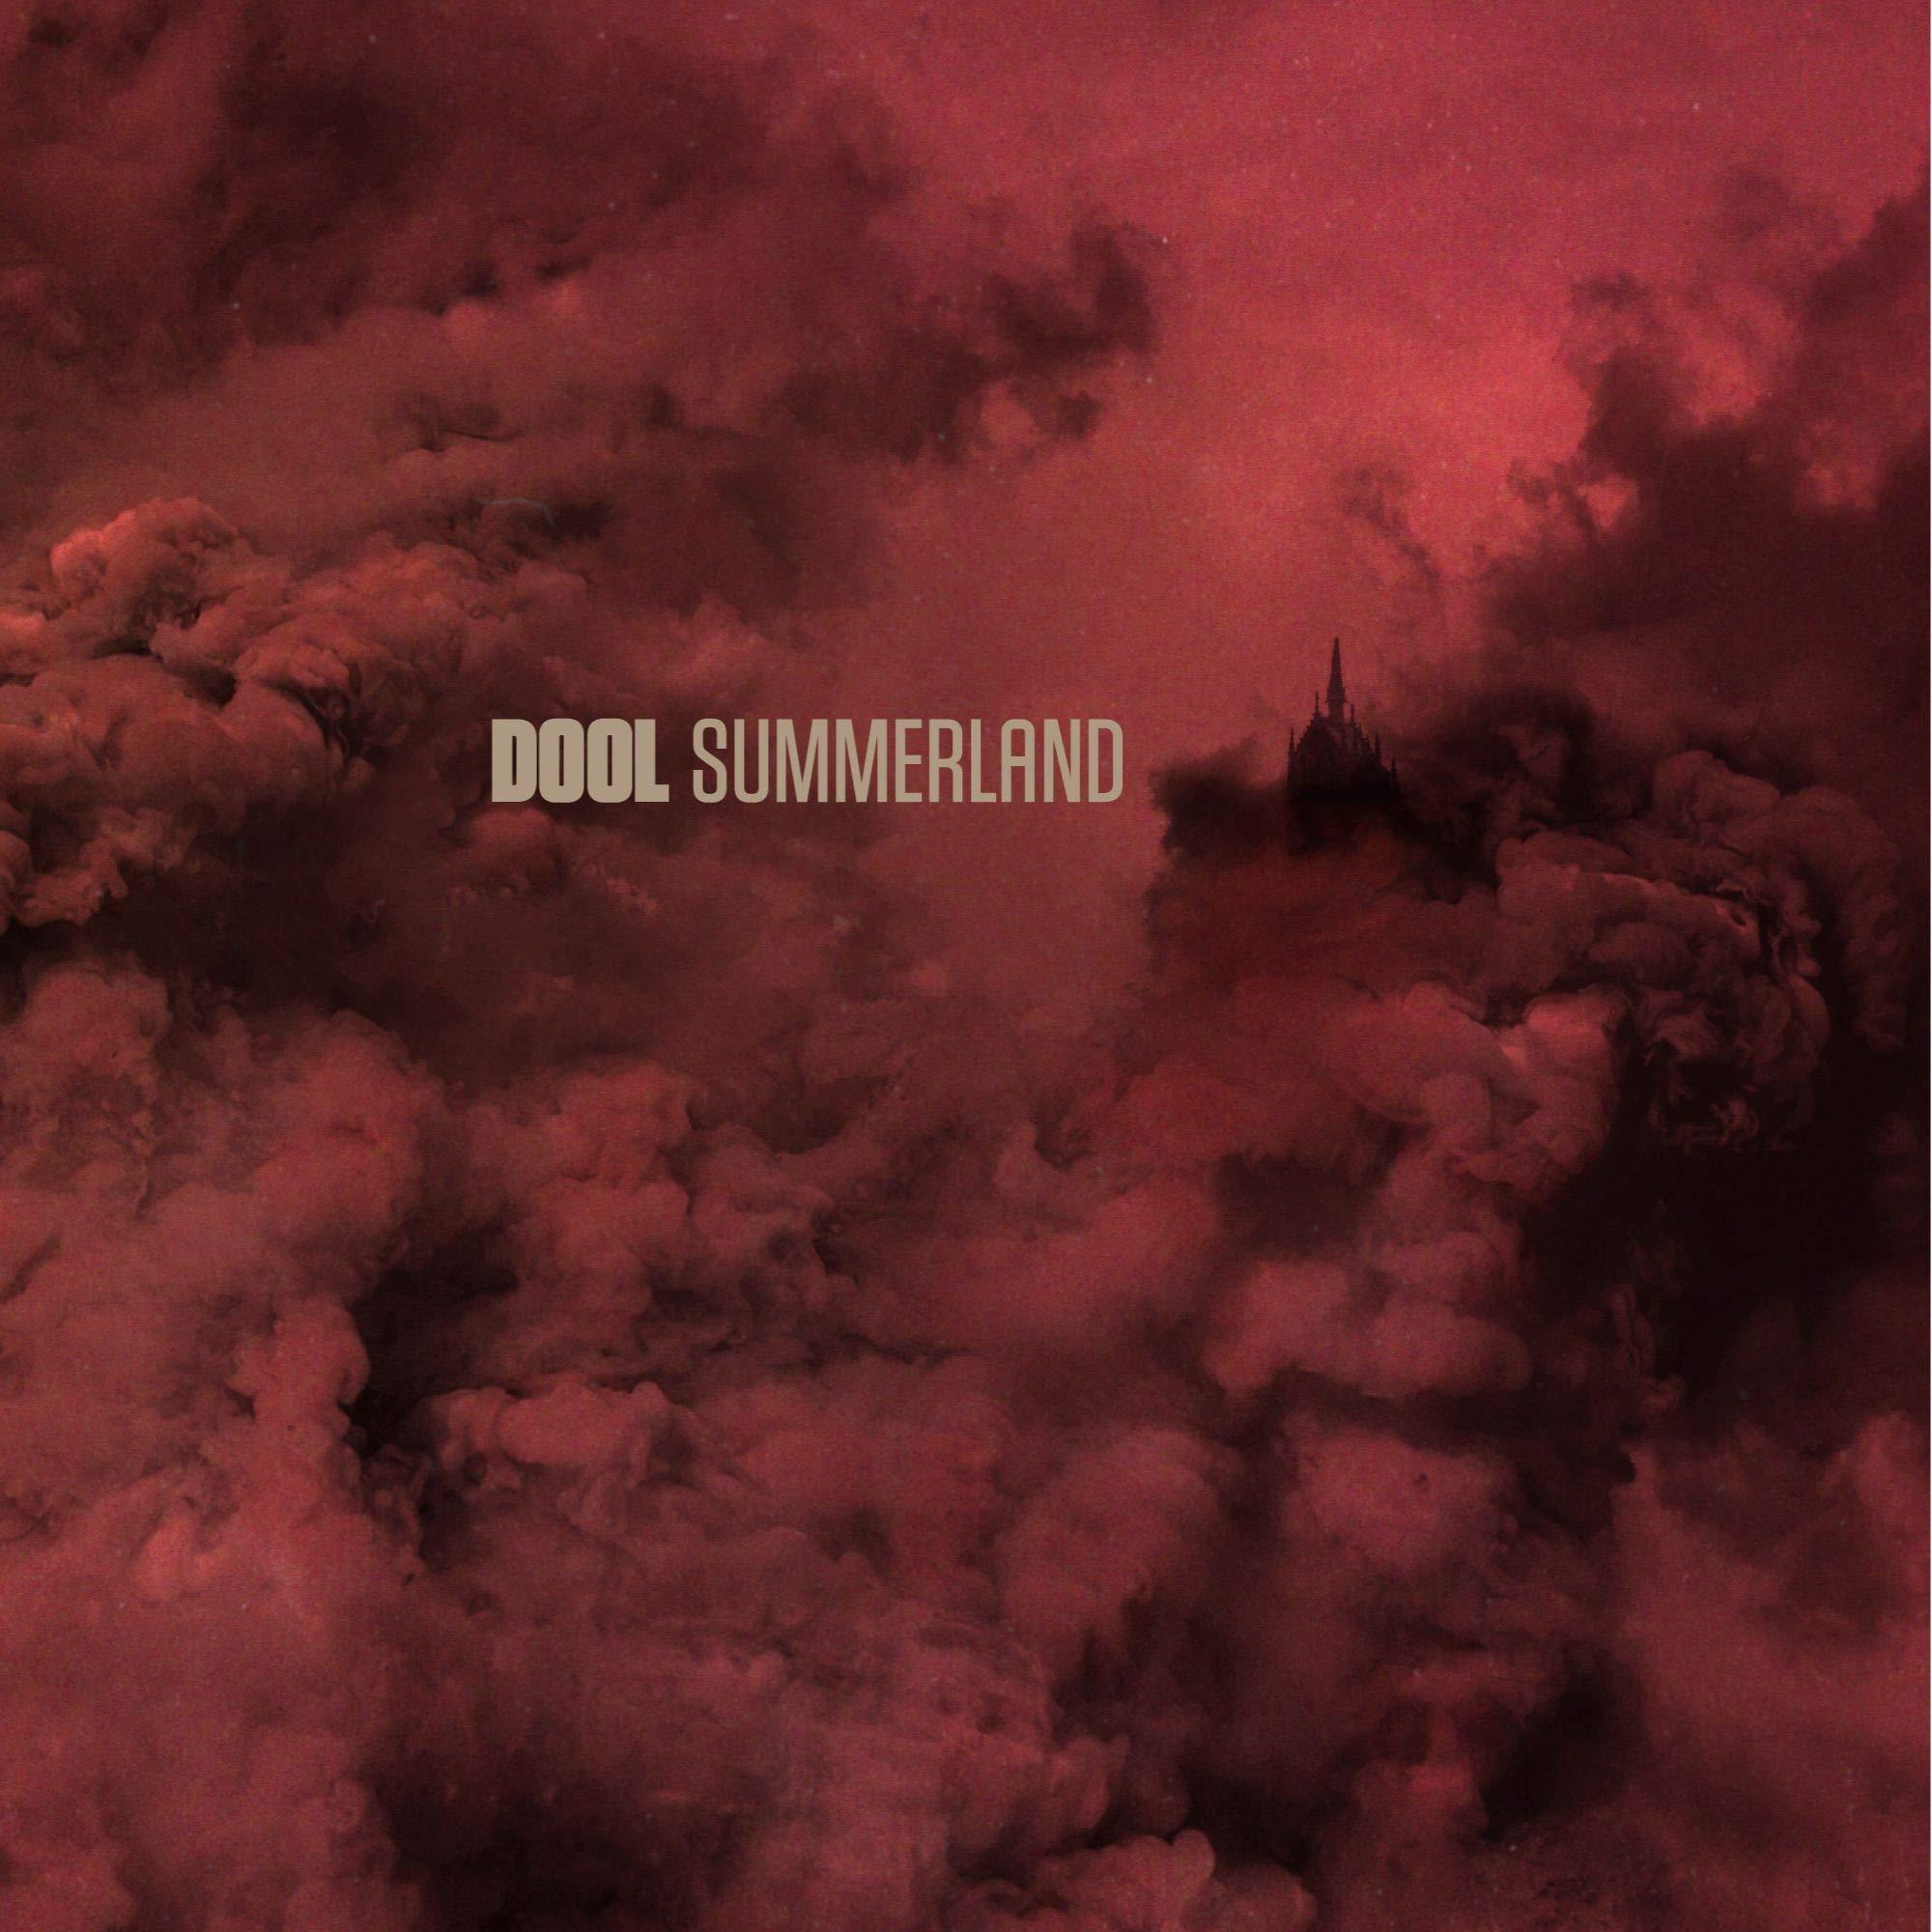 Dool - Summerland (2020) [FLAC] Download